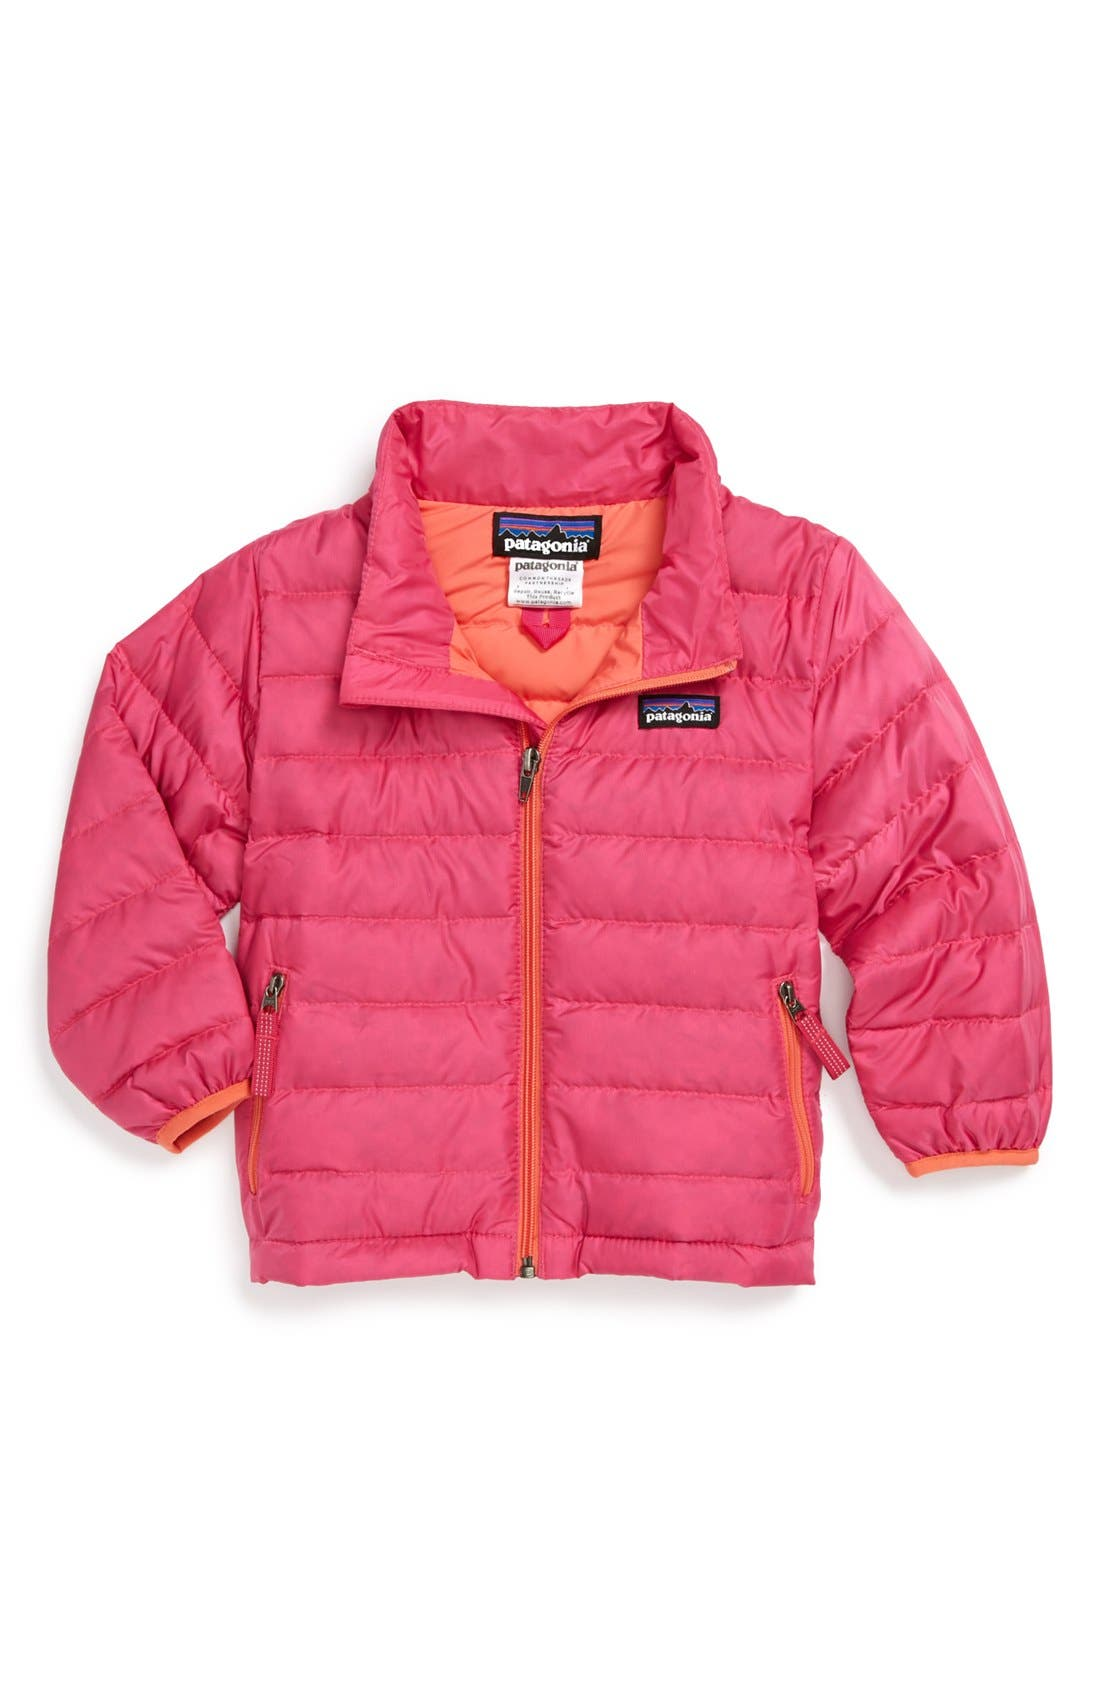 Alternate Image 1 Selected - Patagonia Down Jacket (Baby Girls)